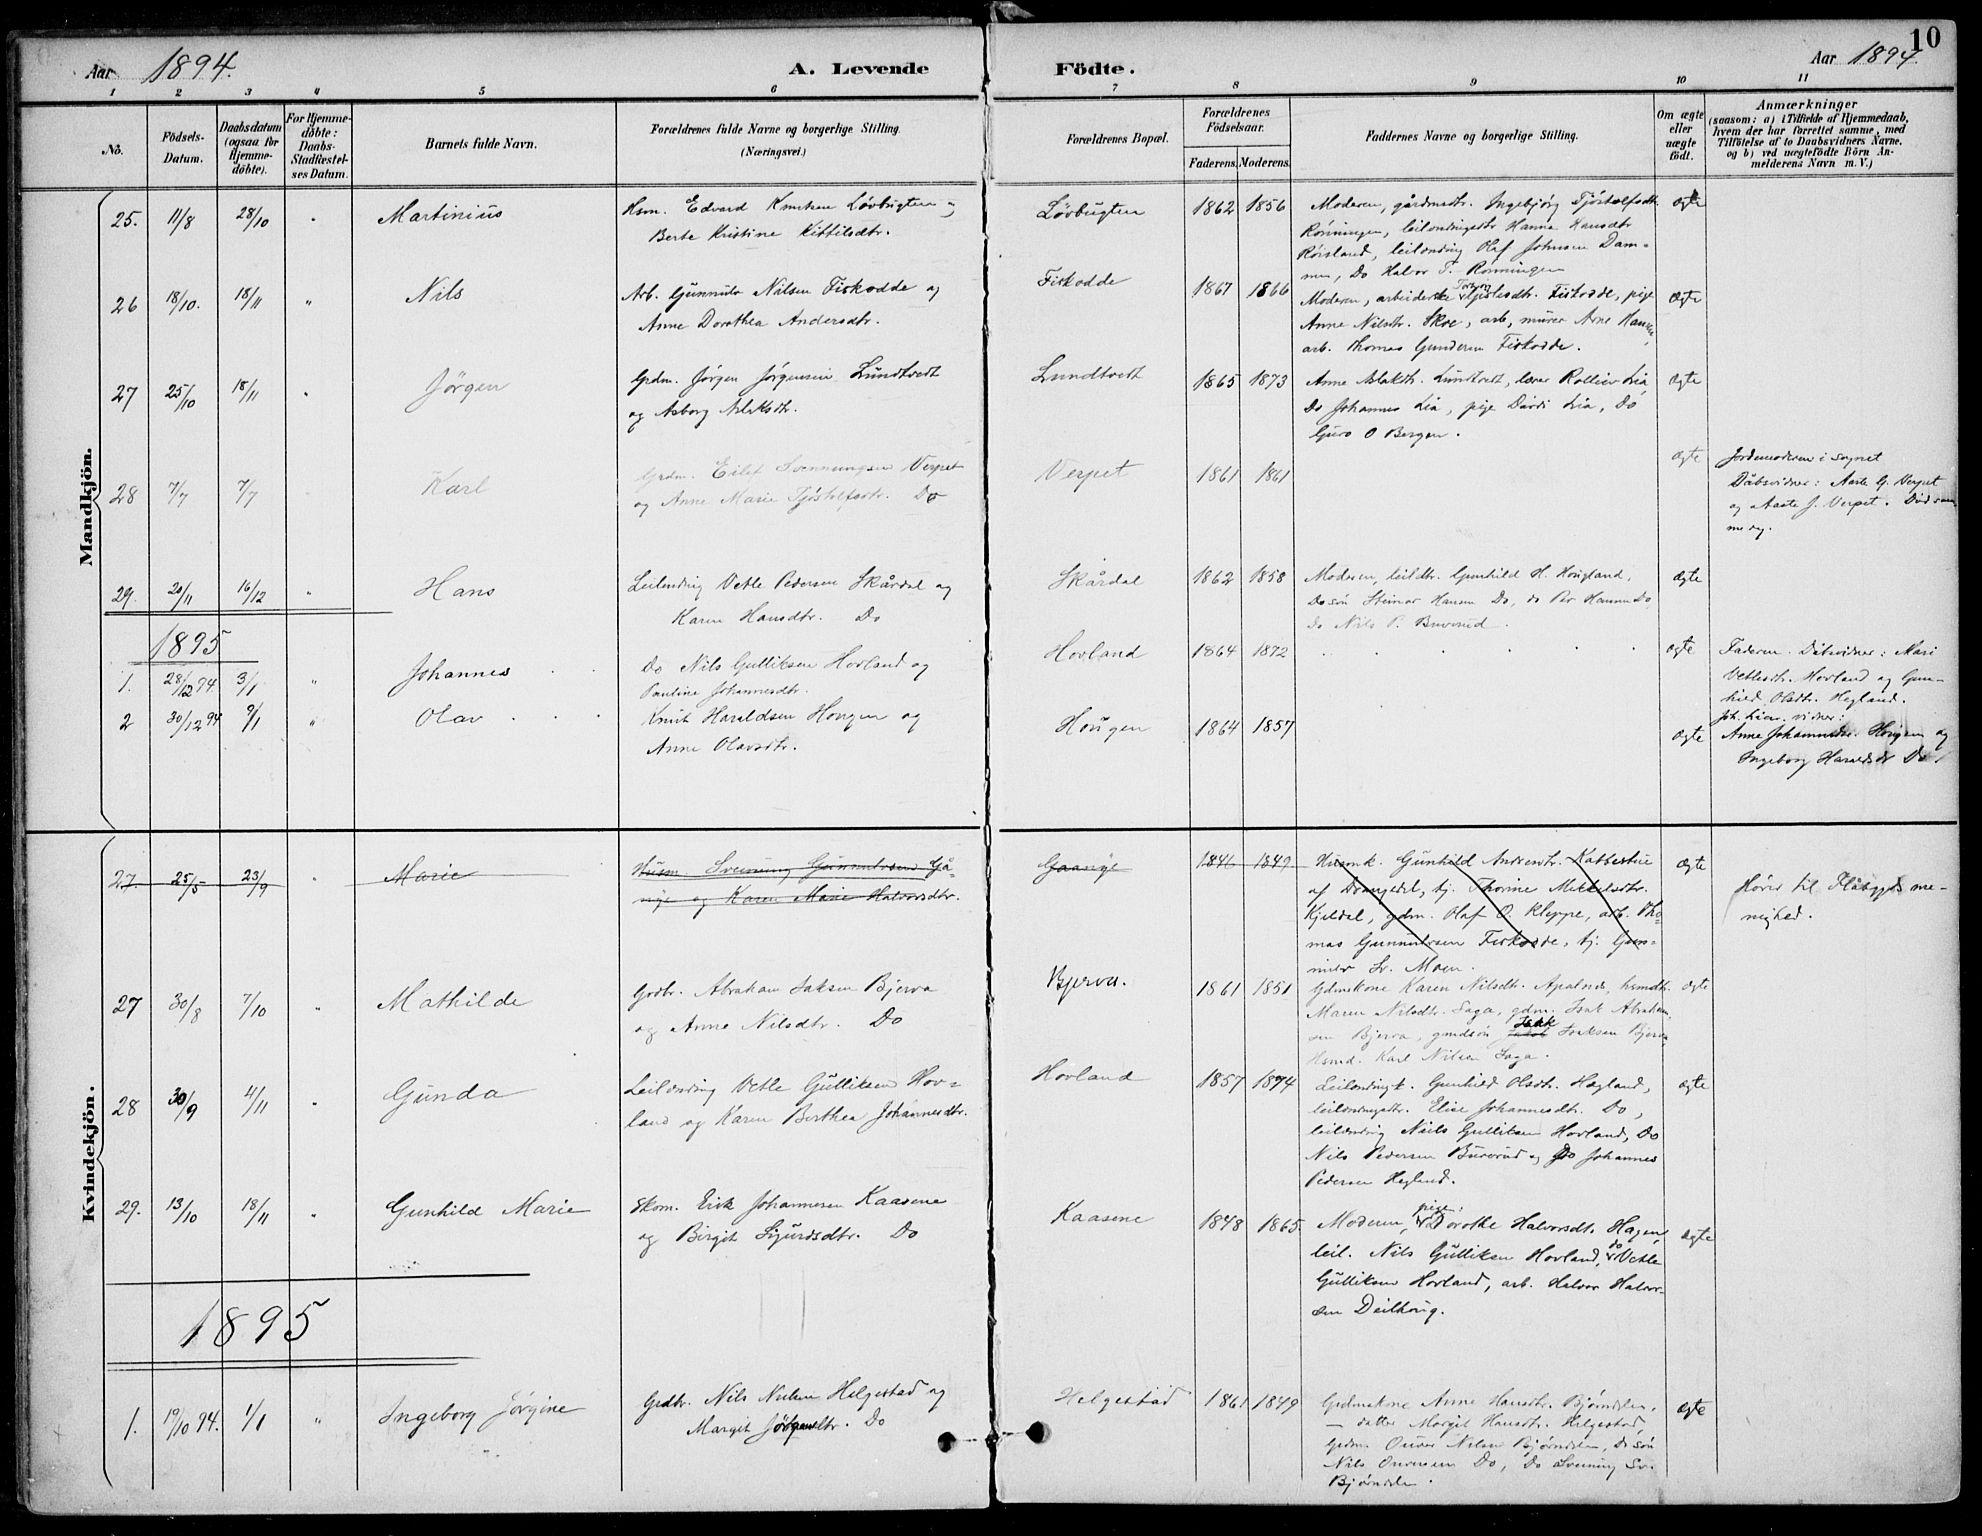 SAKO, Lunde kirkebøker, F/Fa/L0003: Ministerialbok nr. I 3, 1893-1902, s. 10